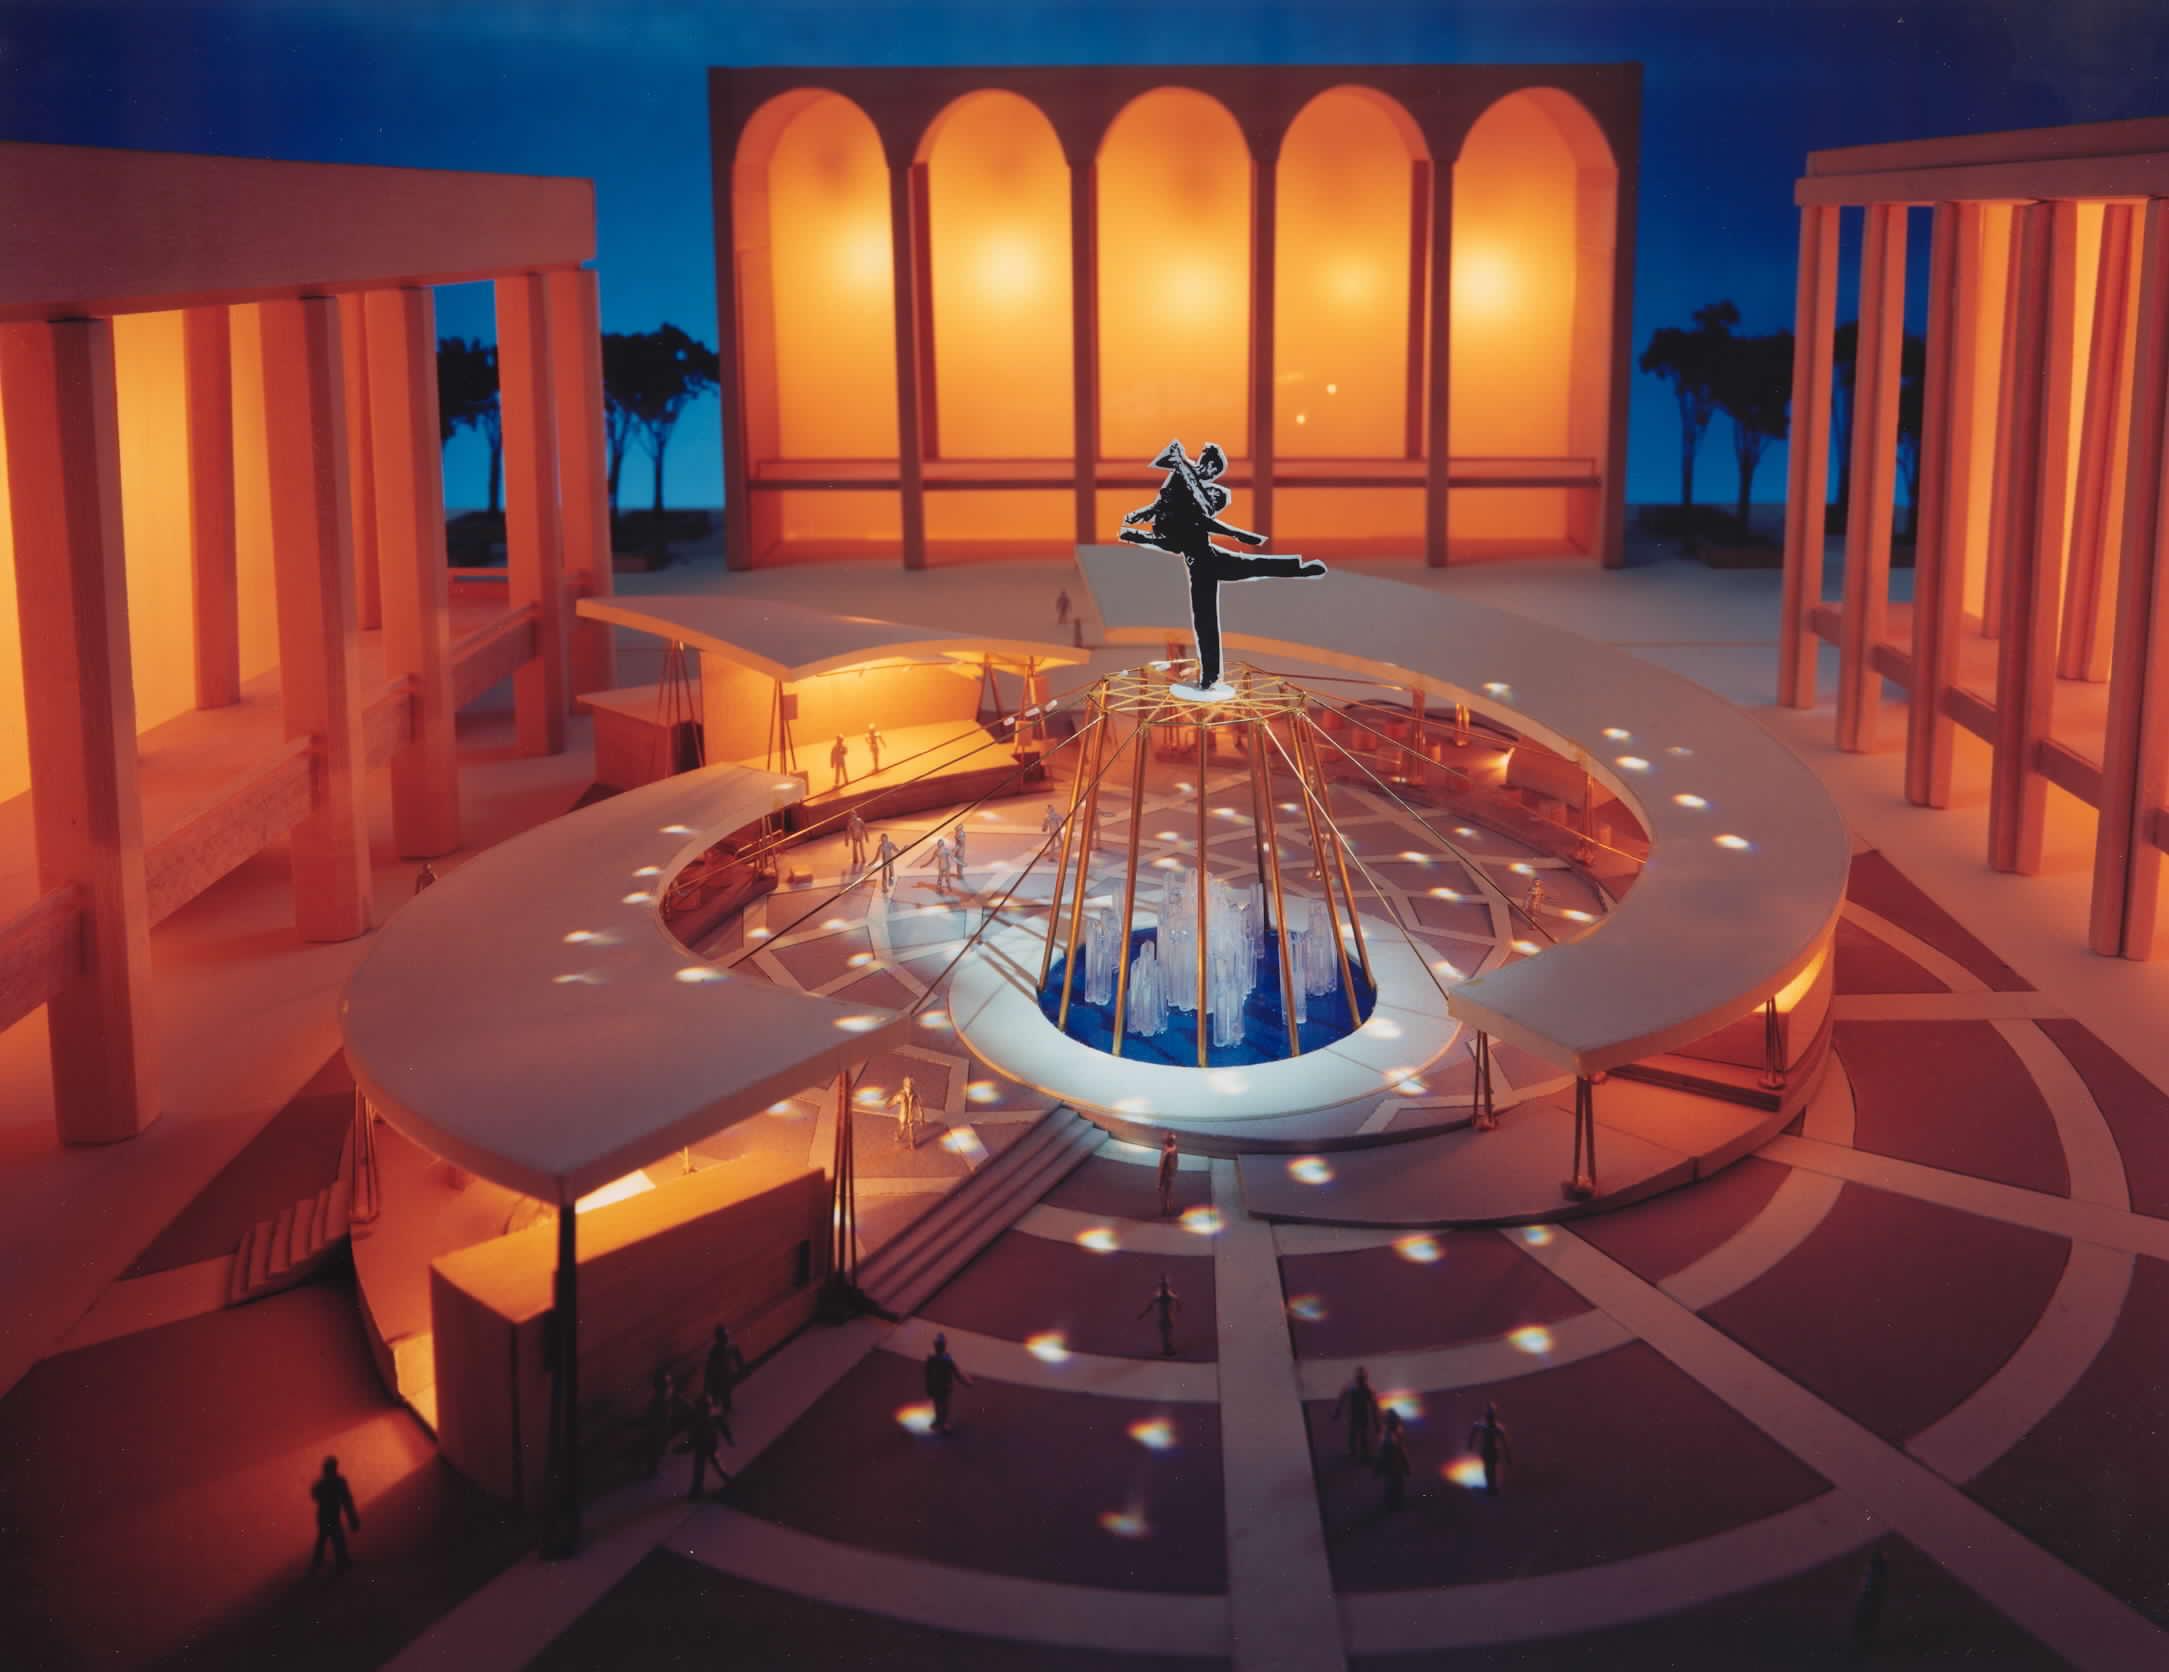 Lincoln-Center-Pavilions-Alan-Joslin-01.jpg